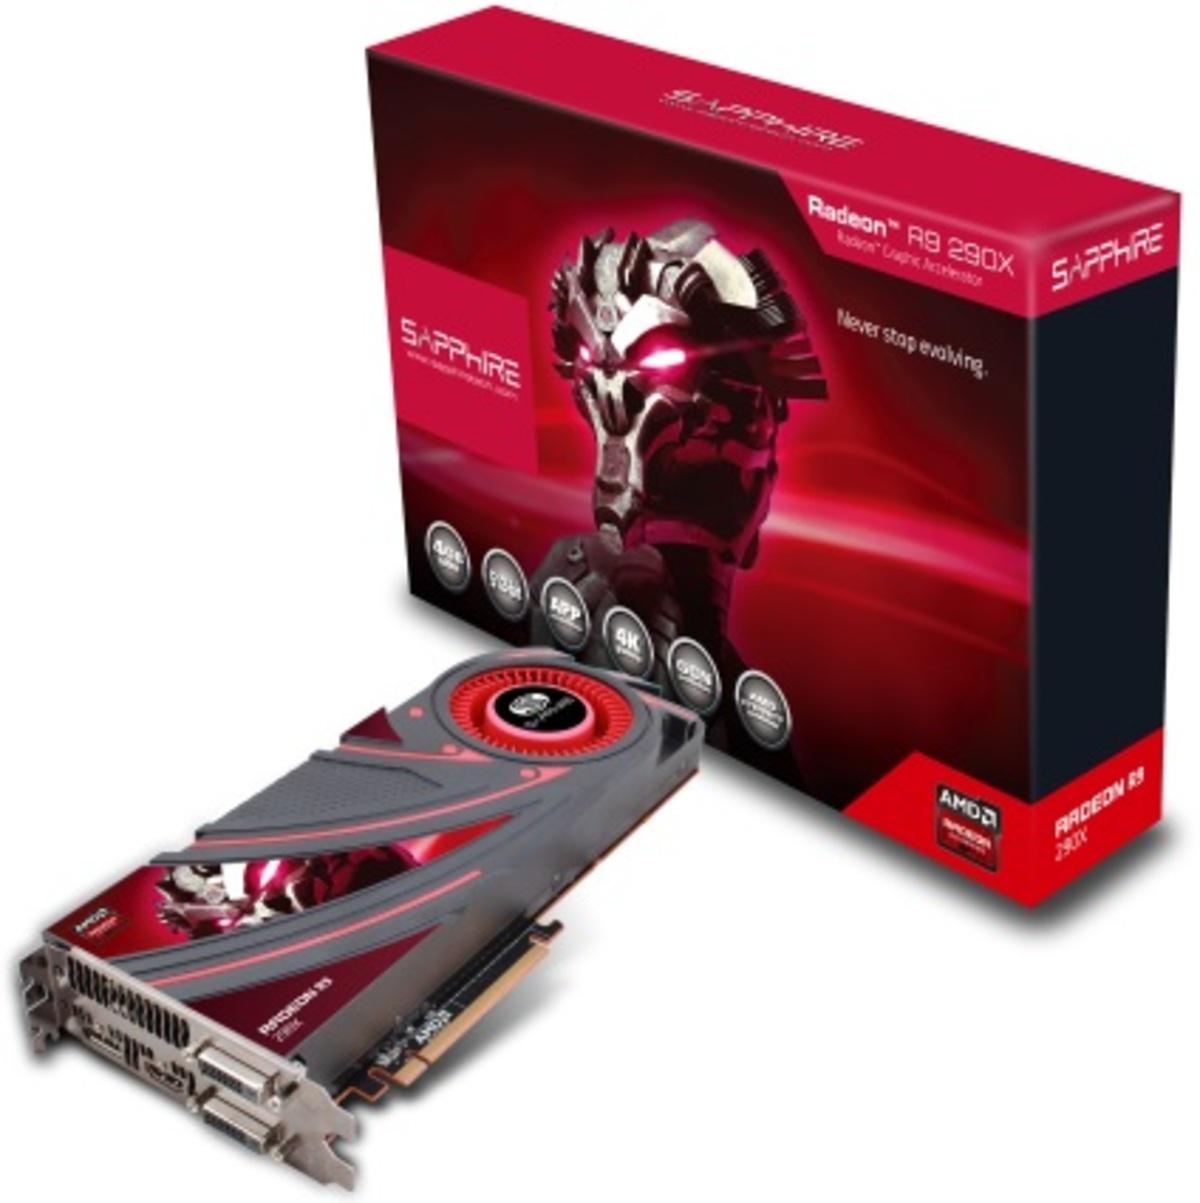 AMD Radeon R9 290X Caja 09 8